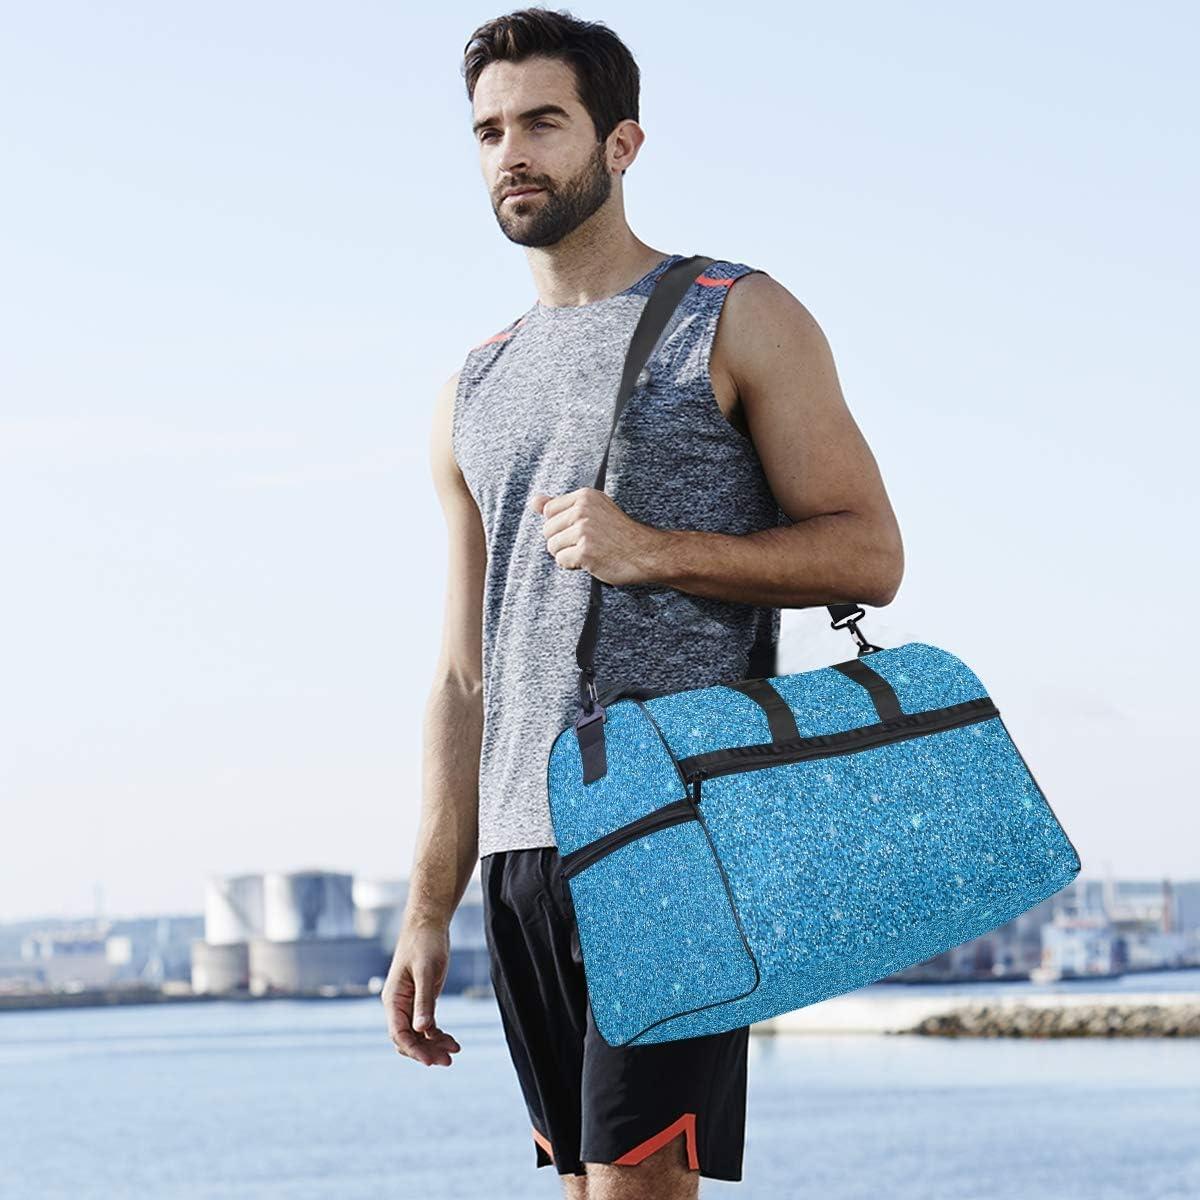 ALAZA Stylish Blue Glitter Stars Sports Gym Duffel Bag Travel Luggage Handbag Shoulder Bag with Shoes Compartment for Men Women